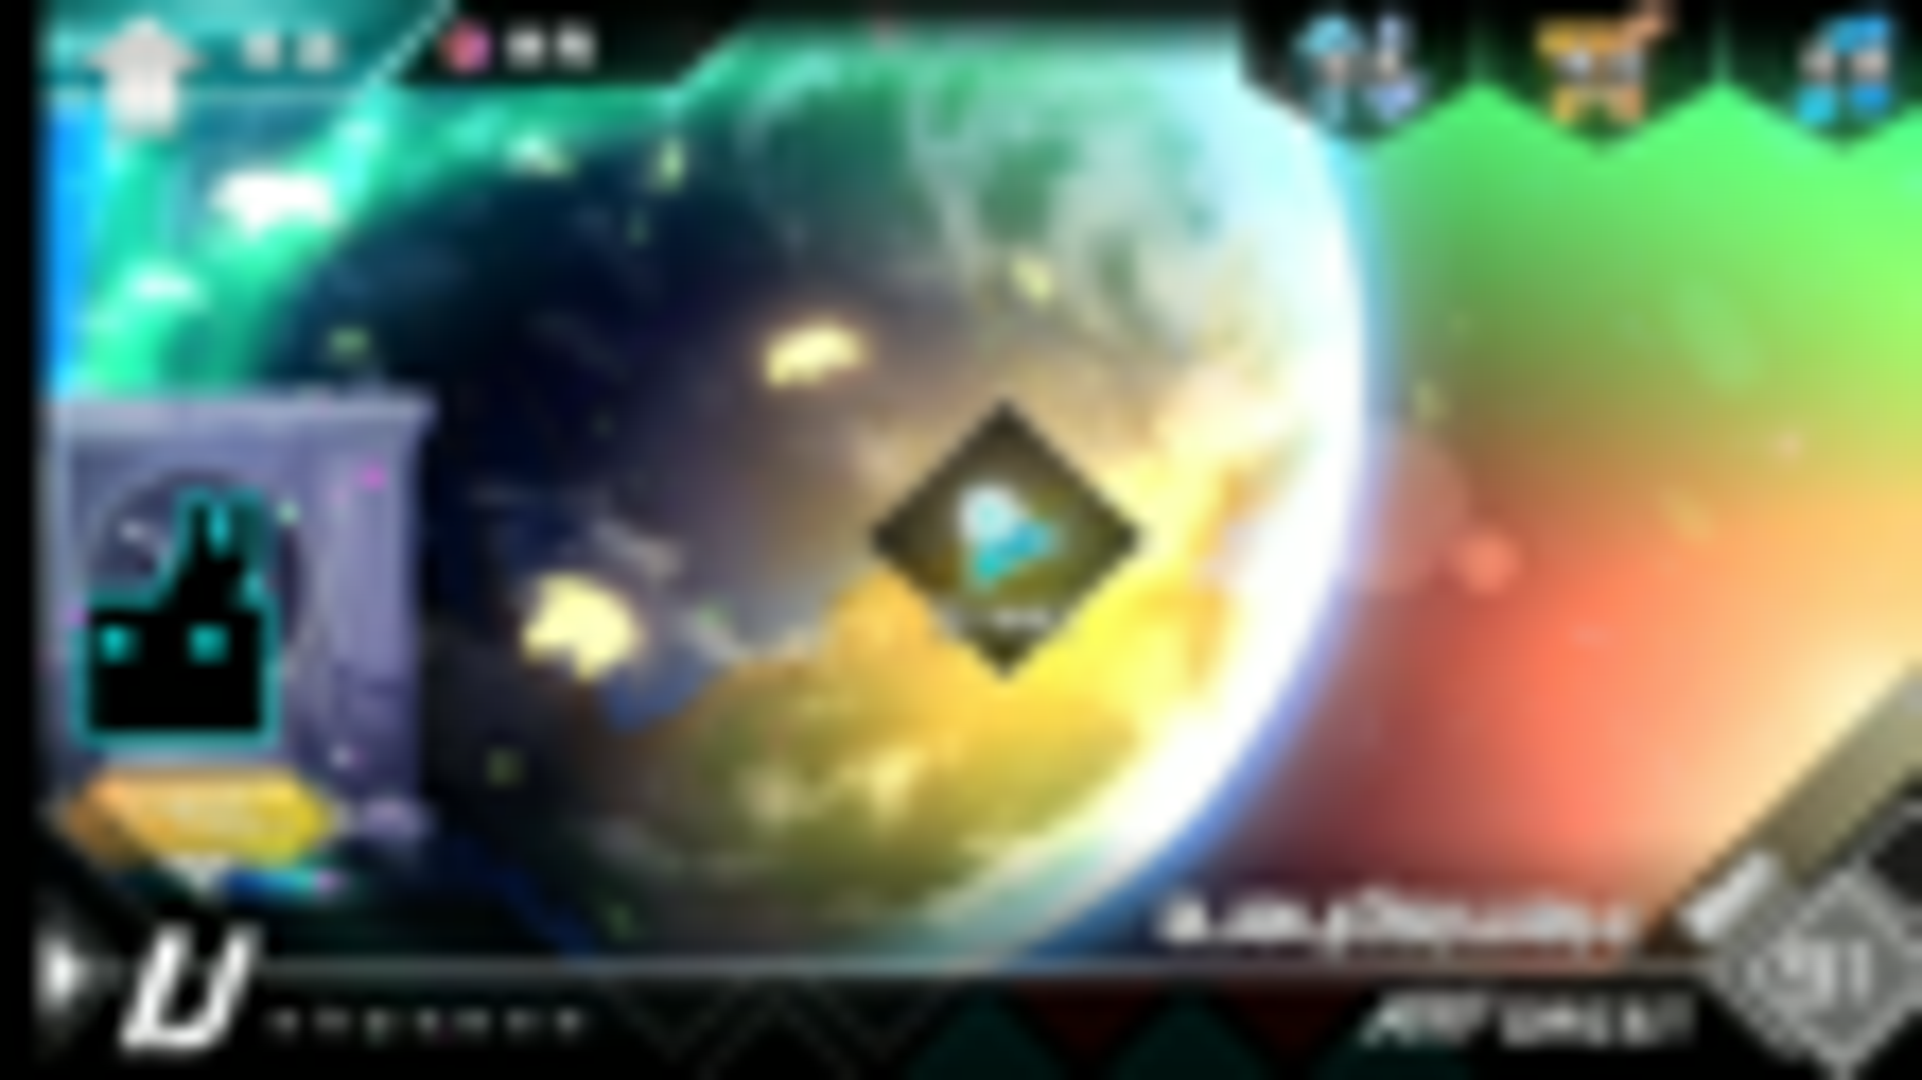 [Dynamix]半球(愚人节屑版本)Auto